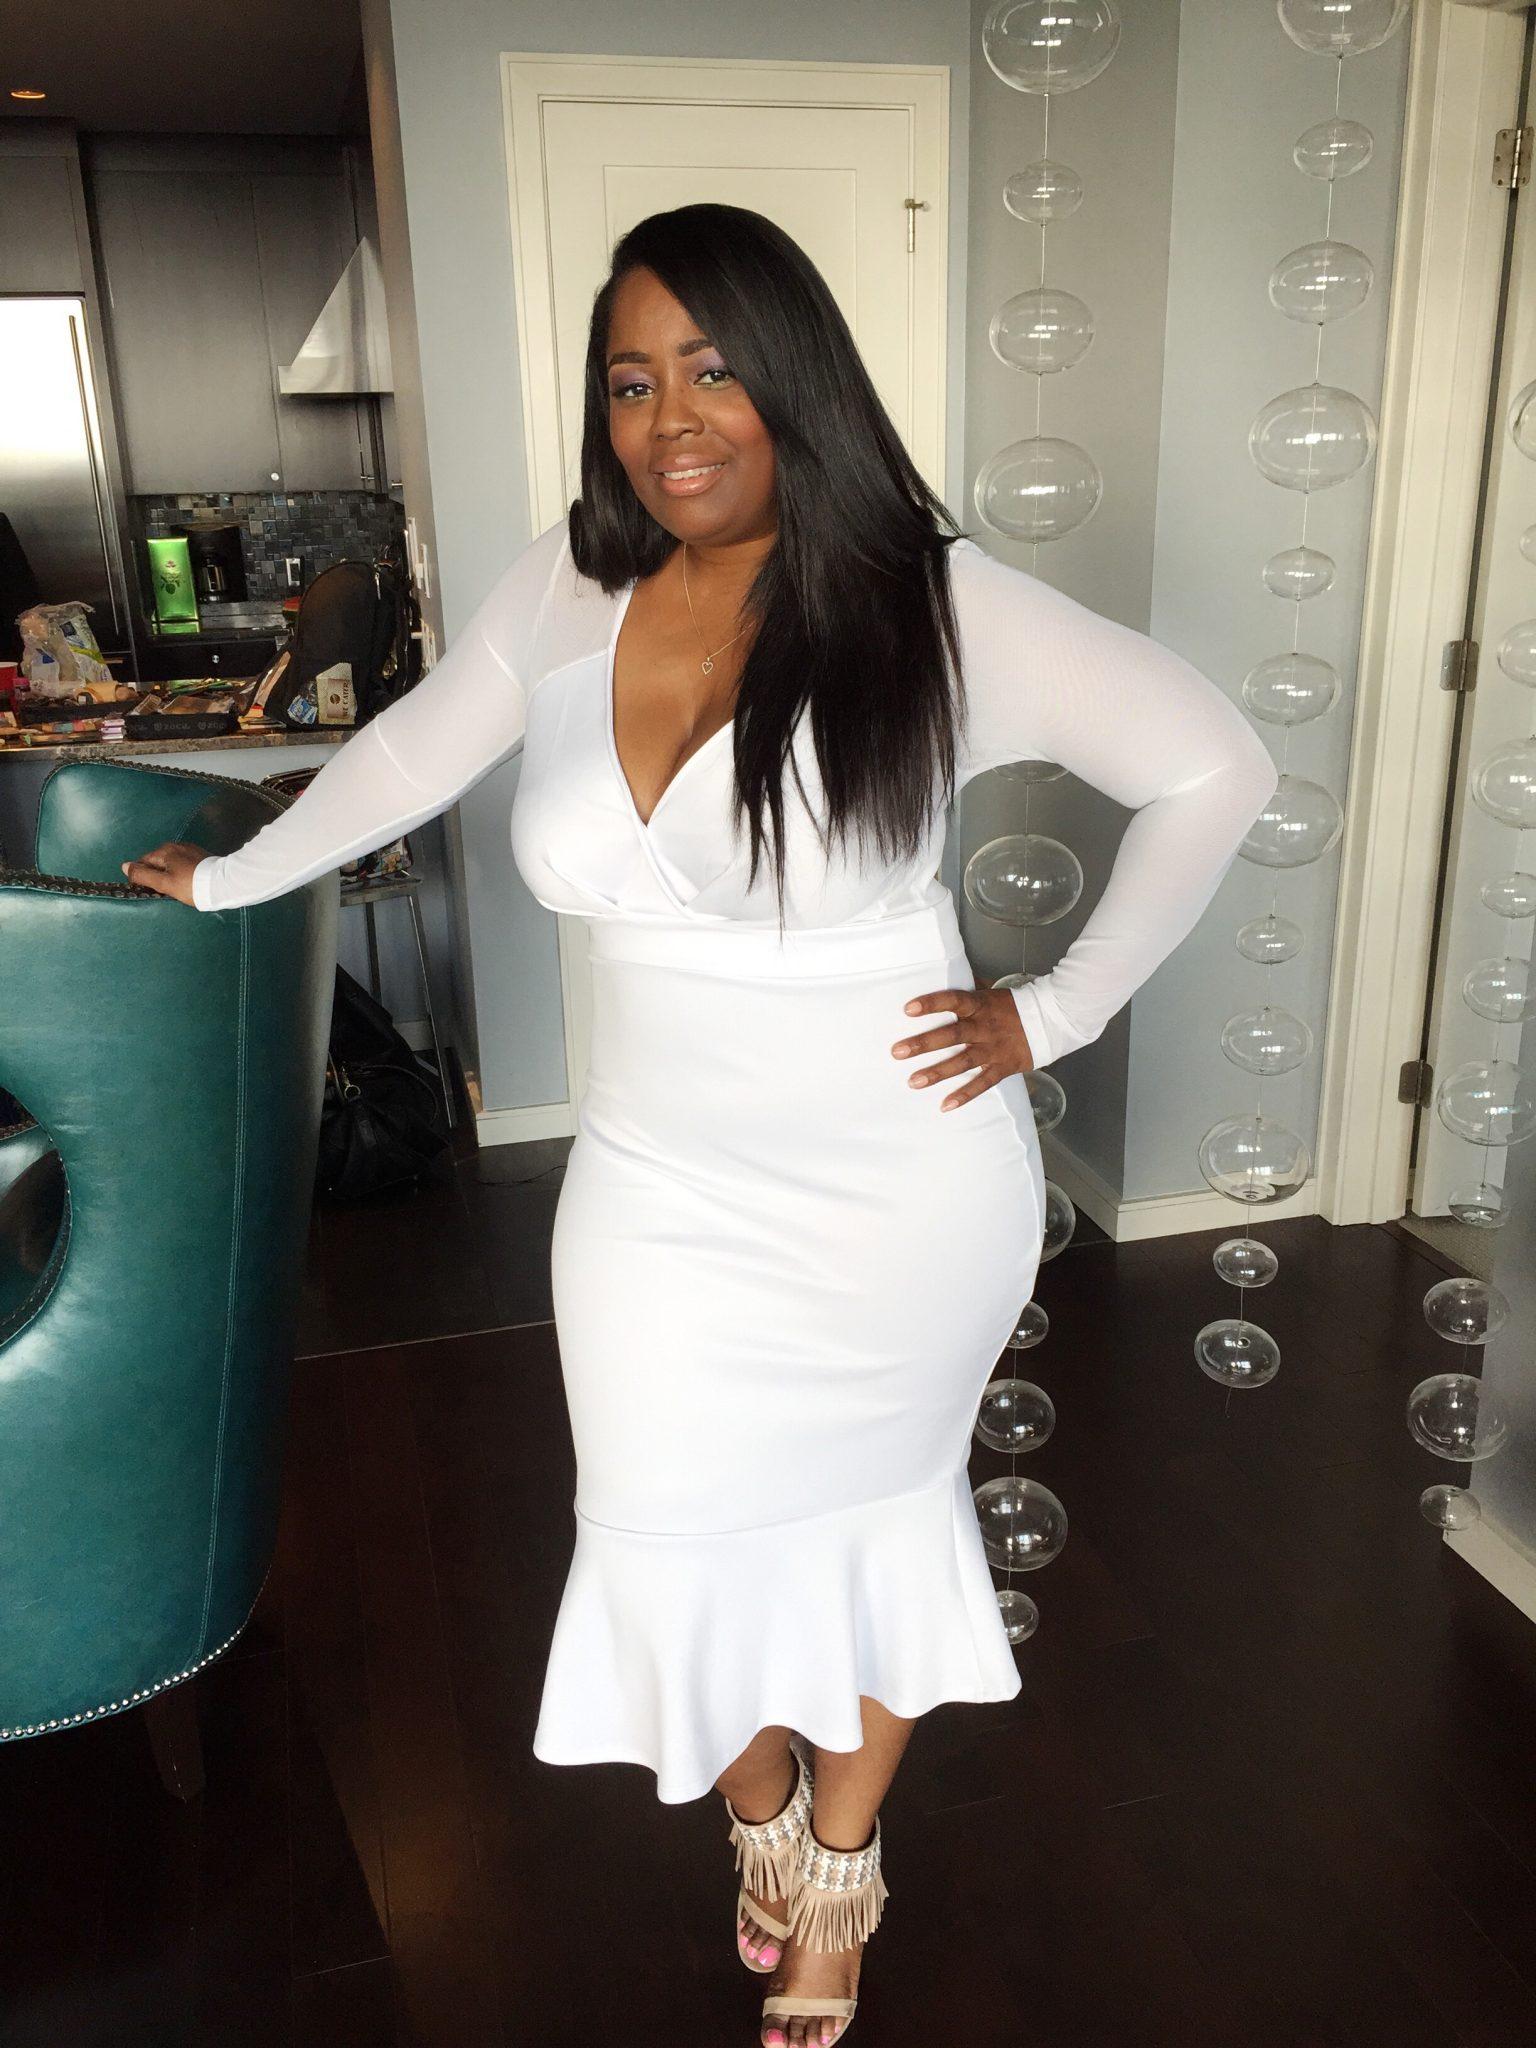 My Style: Mermaid Bottom White Dress